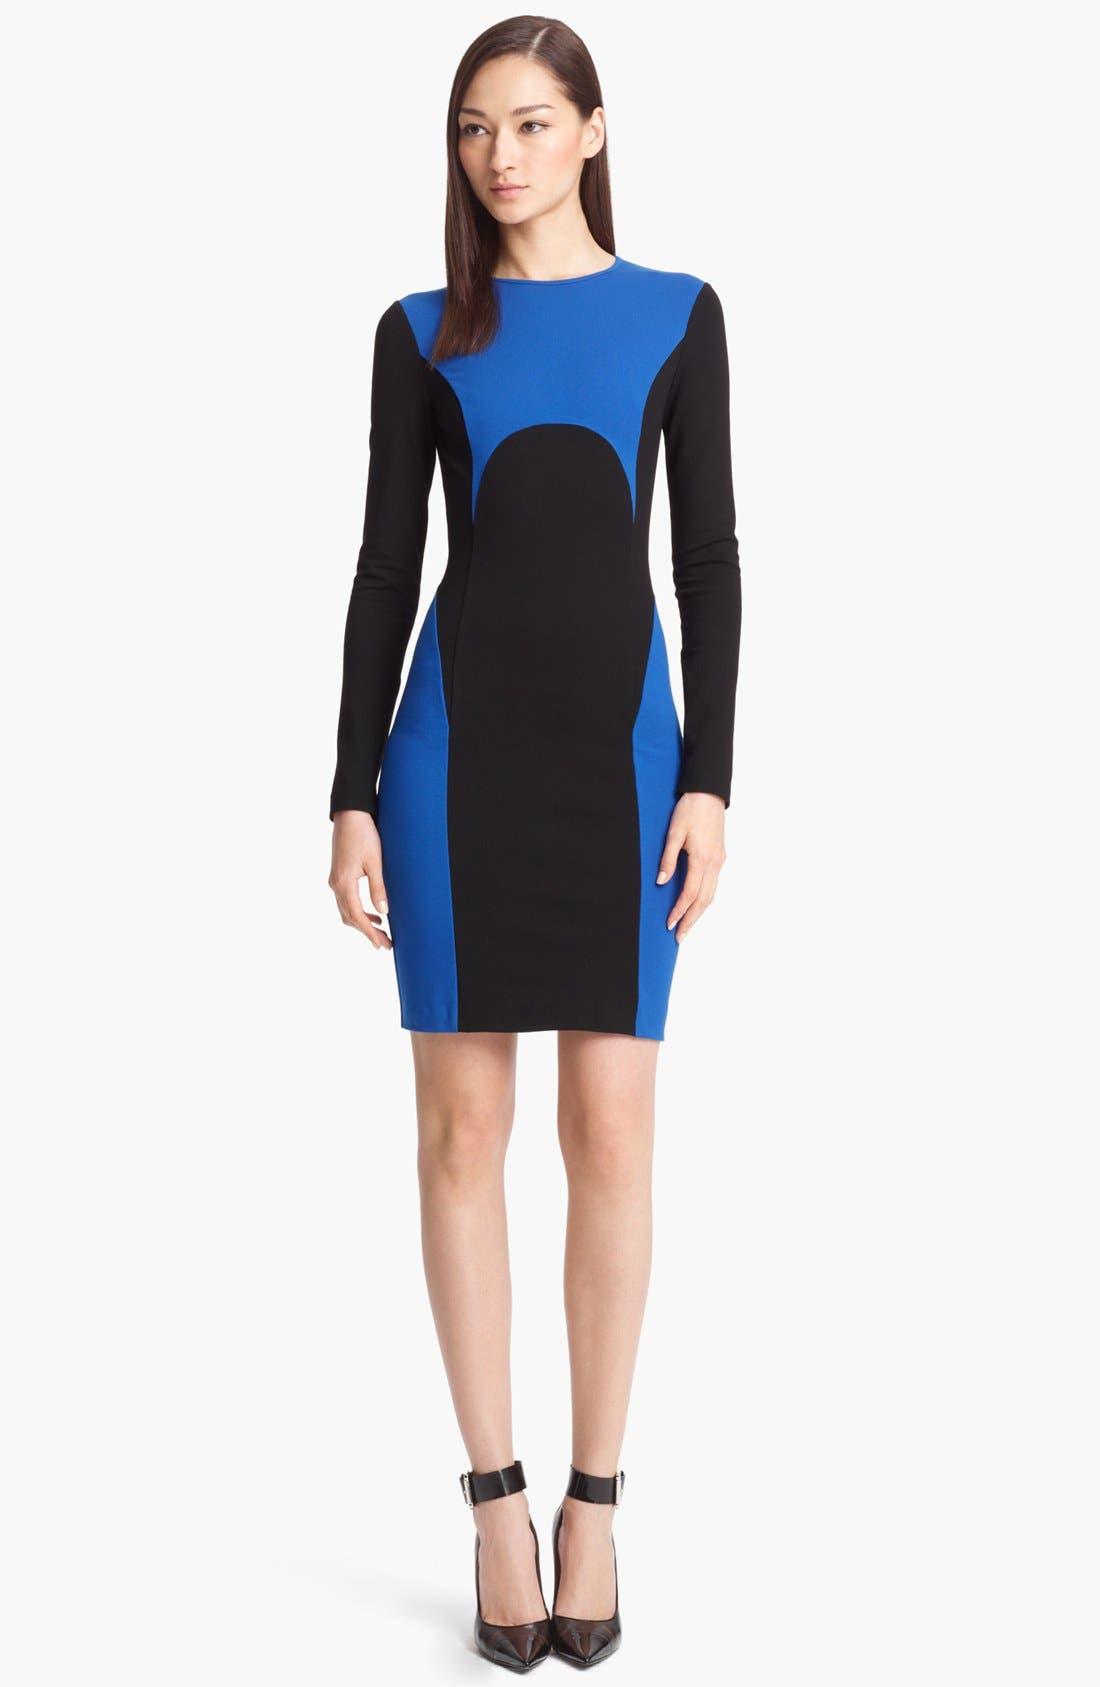 Main Image - Michael Kors Colorblock Jersey Dress